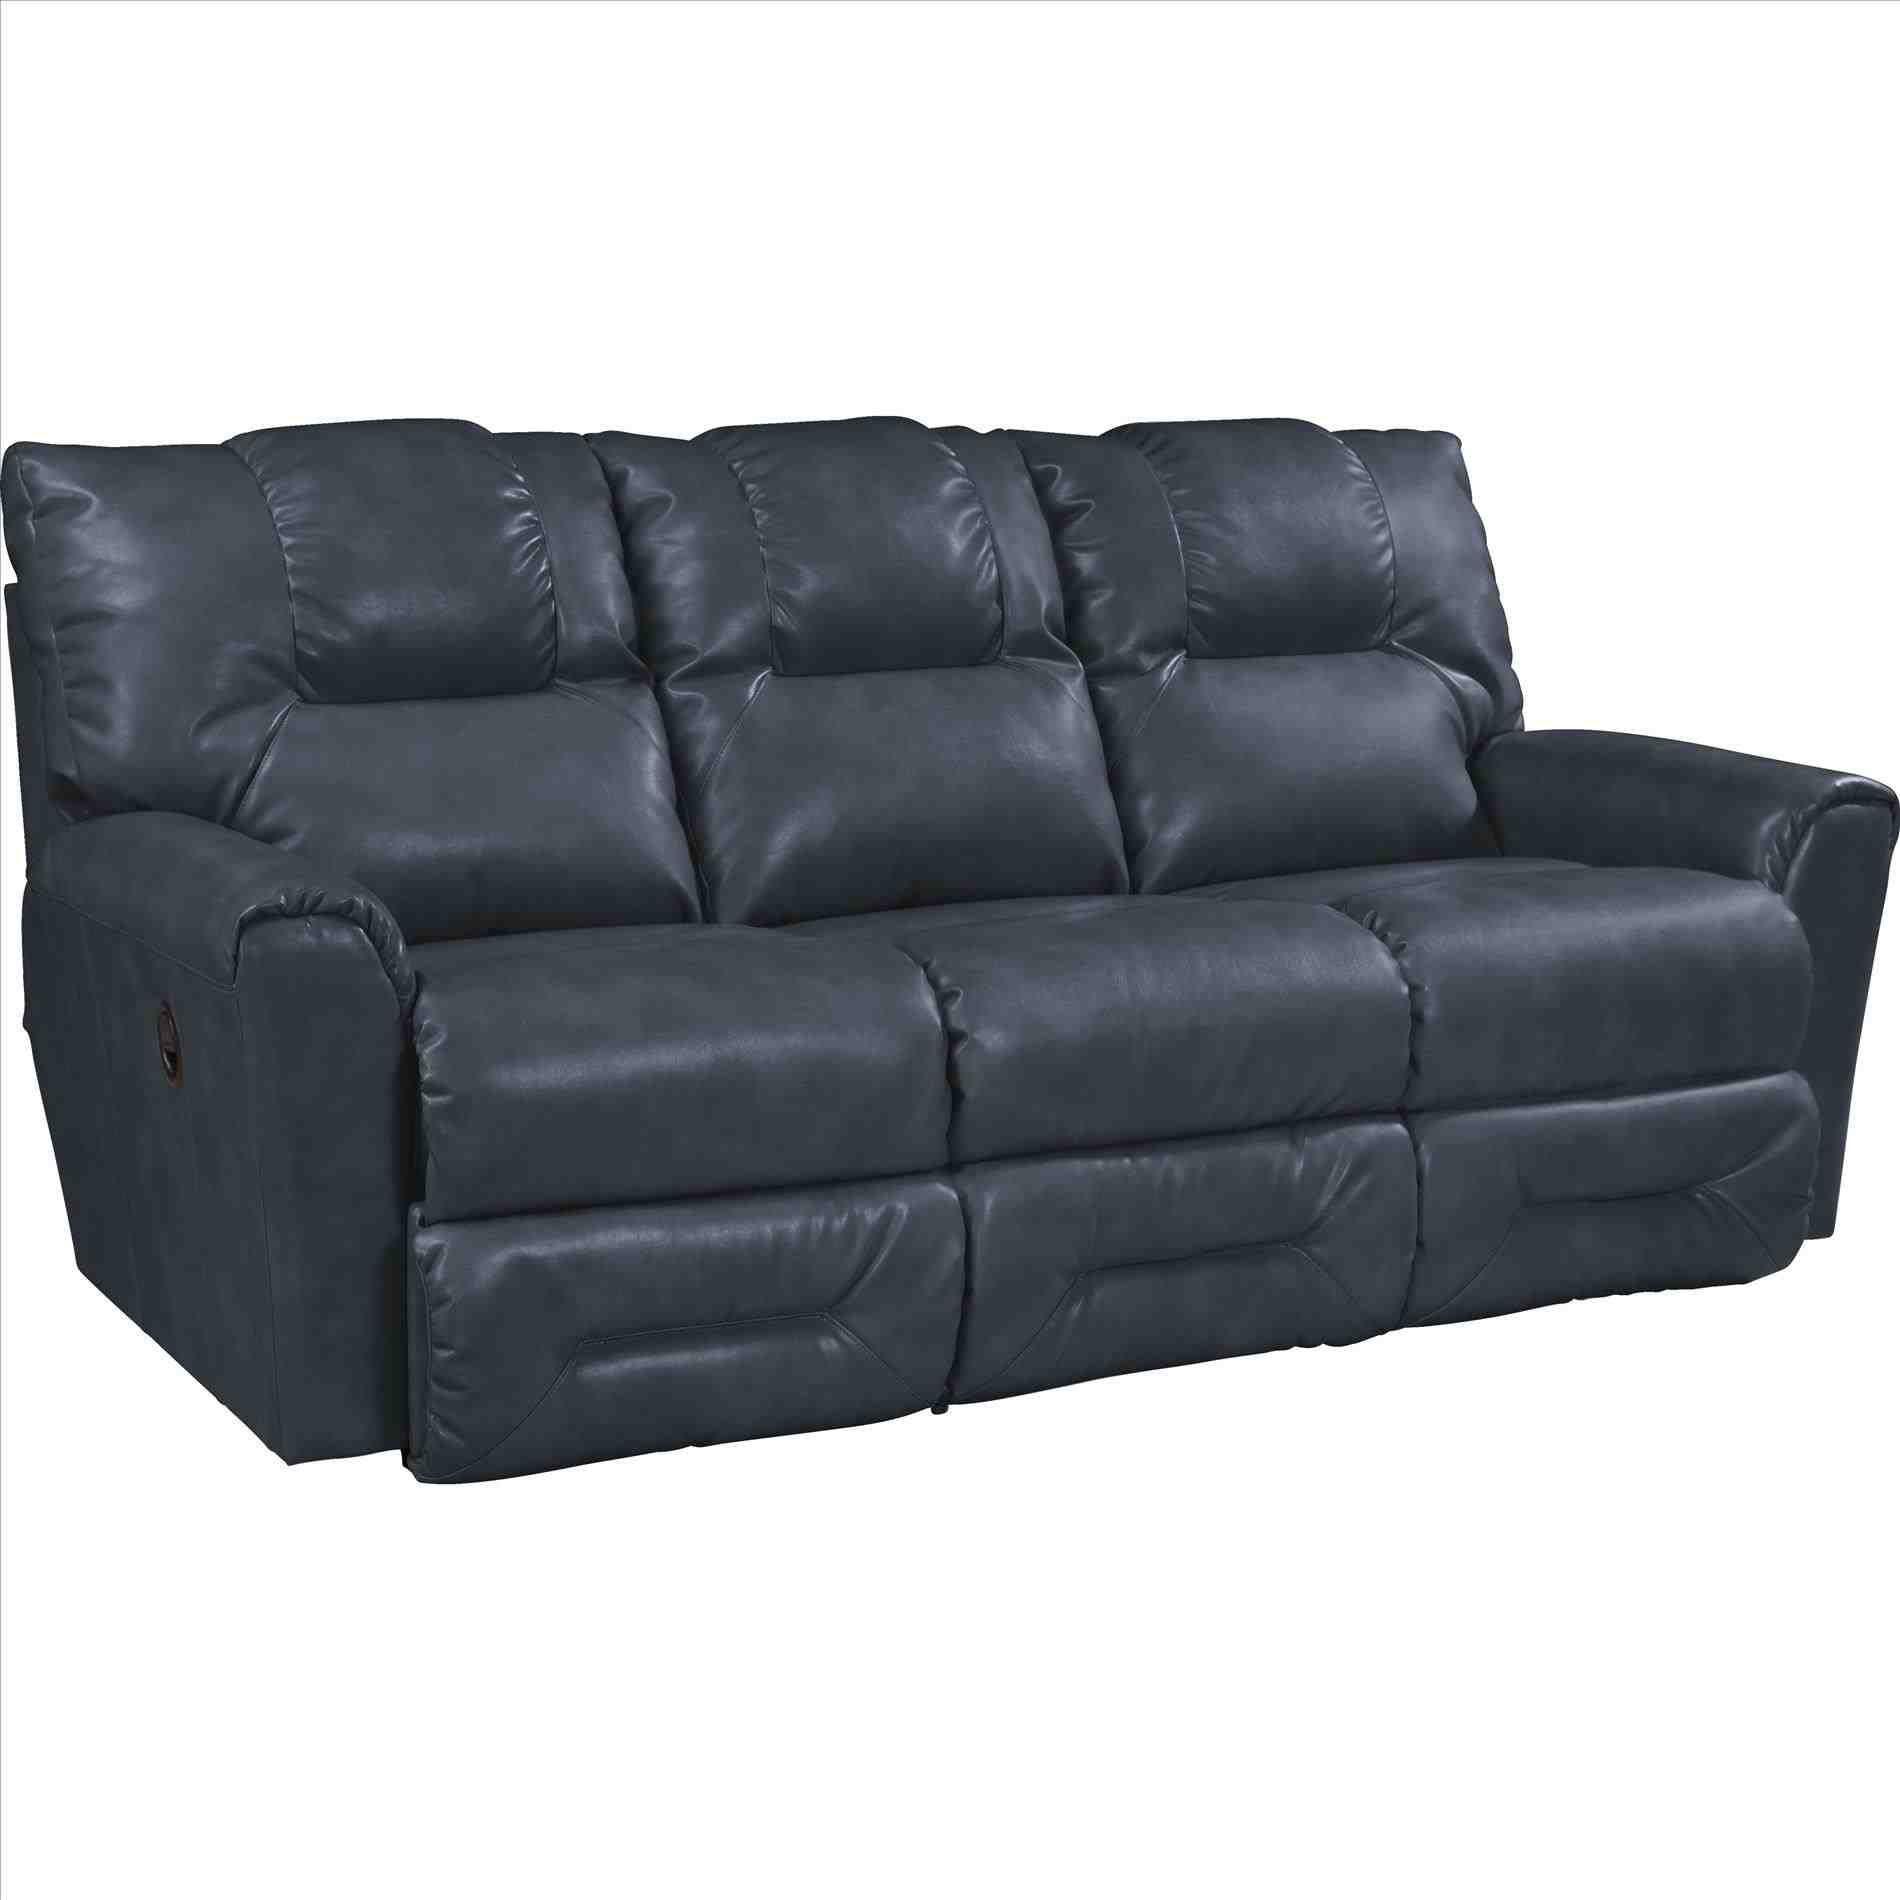 cheap corner sofa beds dublin natalia bed sofas ireland gradschoolfairs